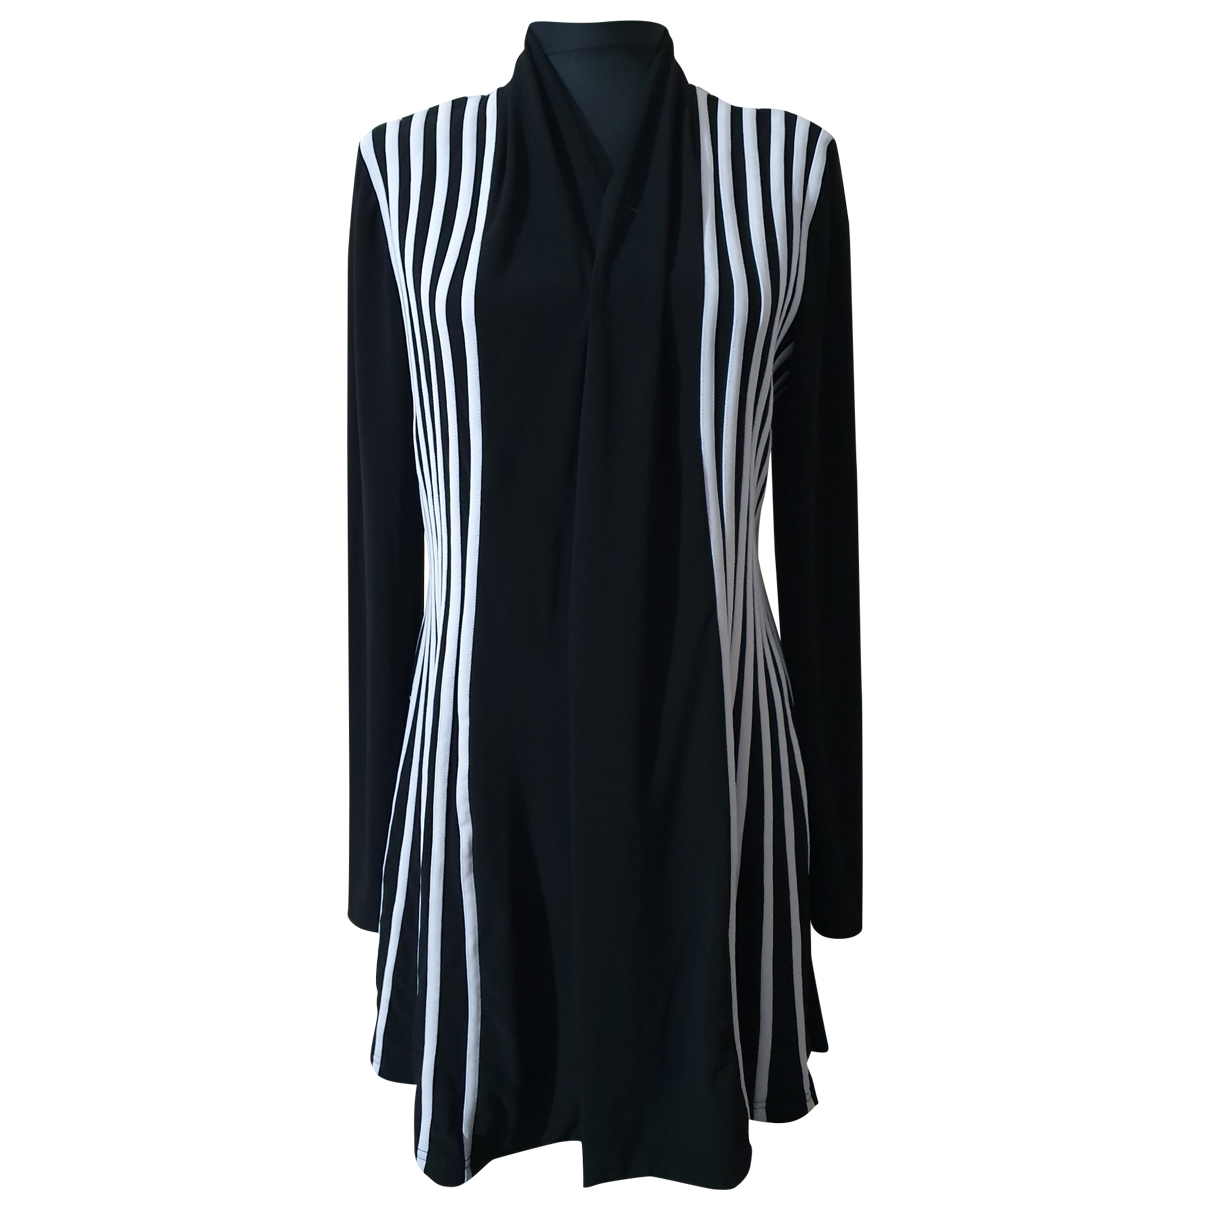 Joseph Ribkoff \N Multicolour Knitwear for Women 38 FR